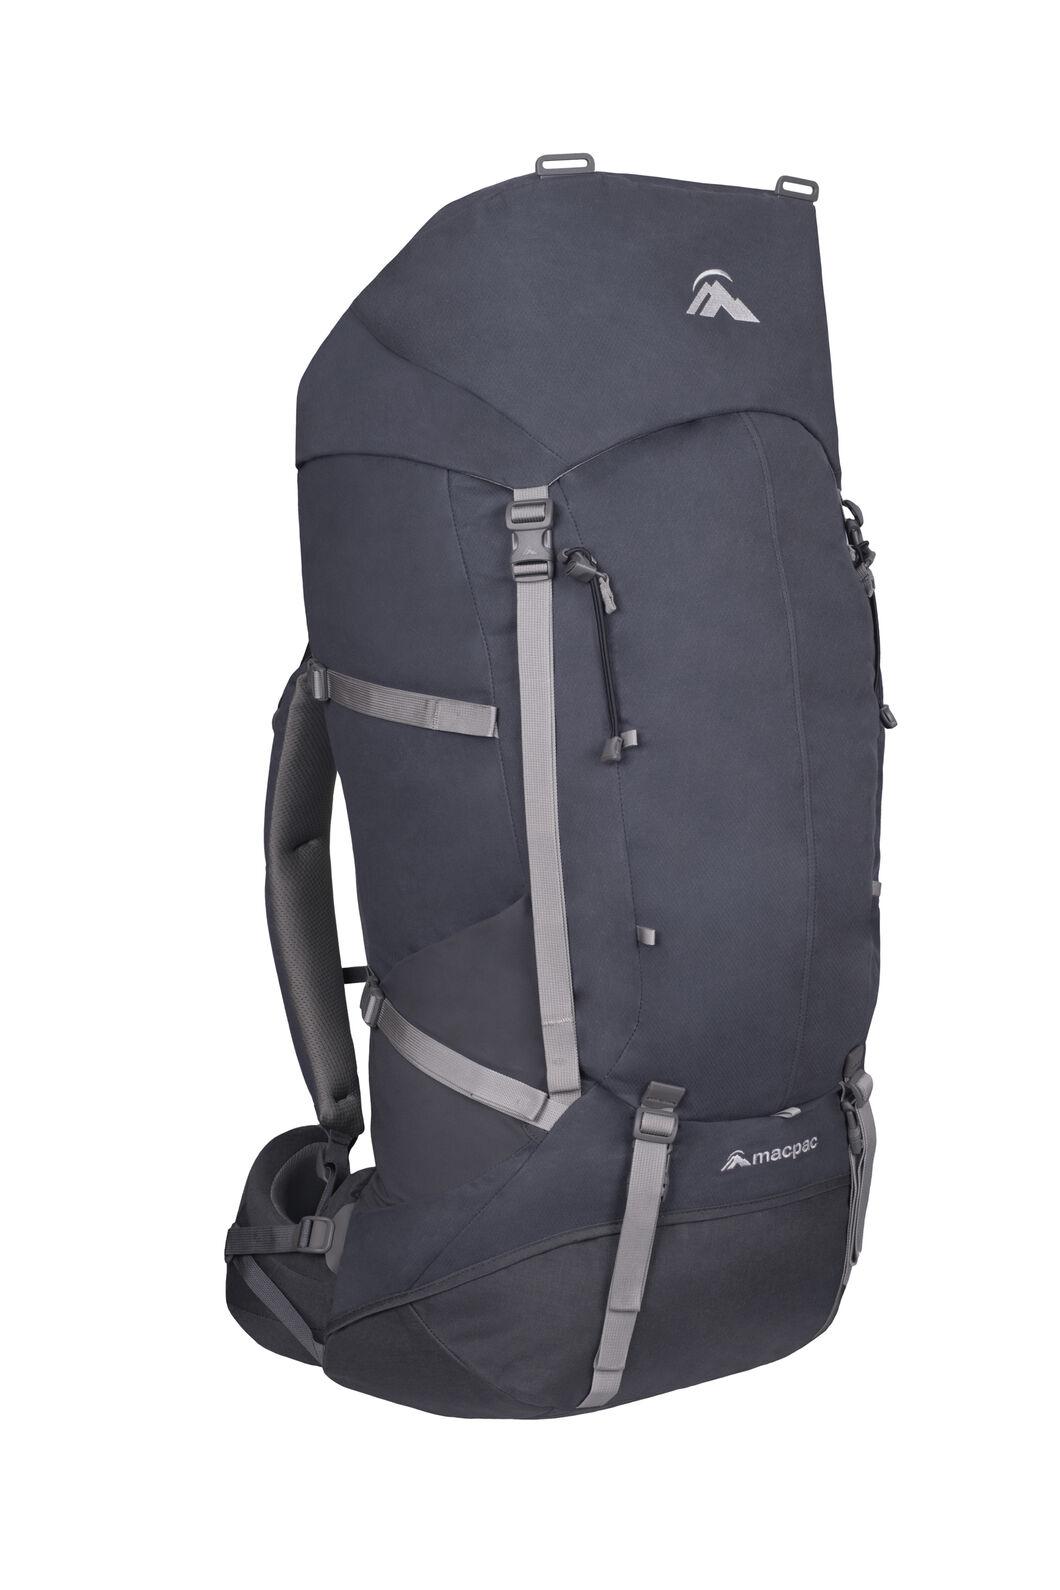 Macpac Cascade 65L AzTec® Hiking Pack, Slate, hi-res